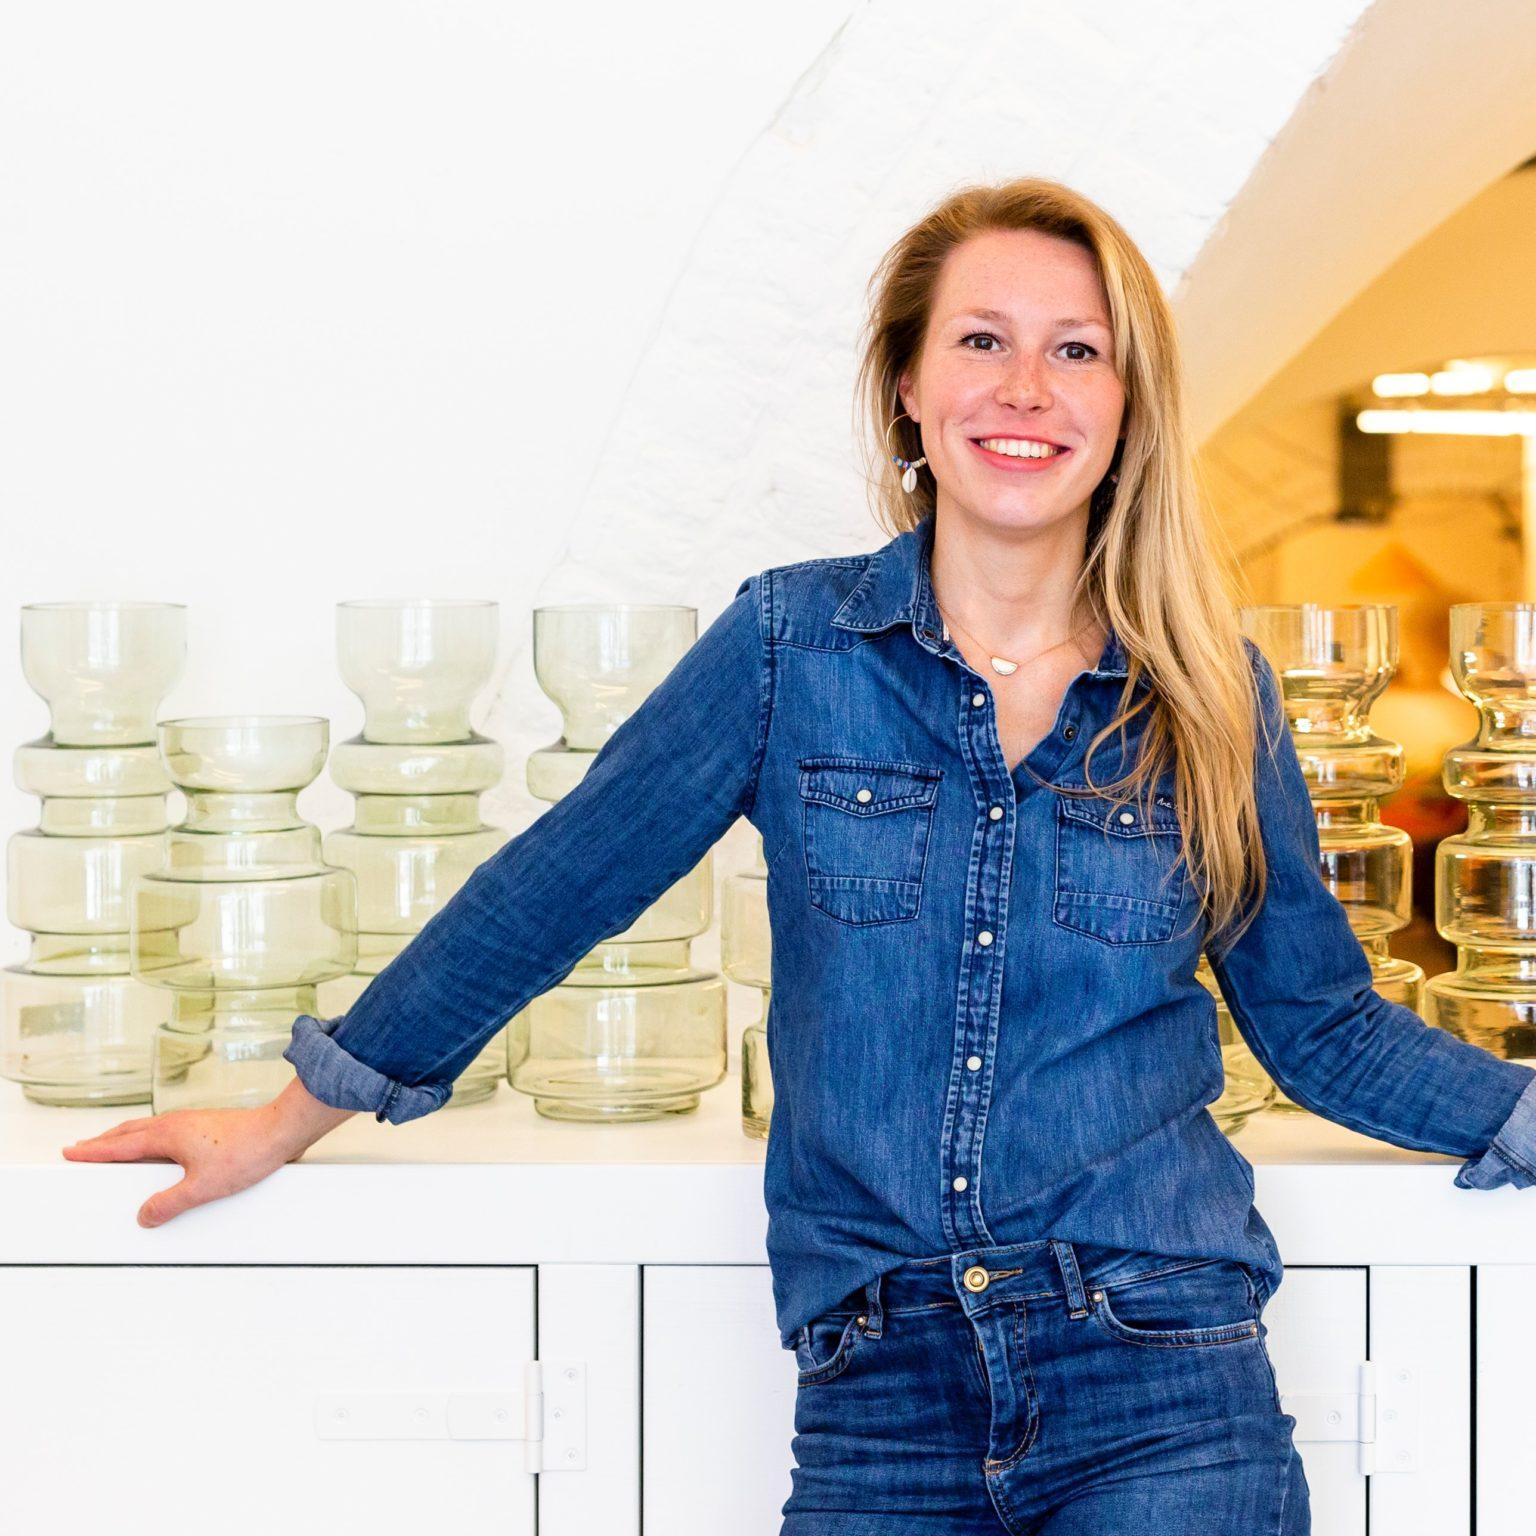 Lisa van Scherpenzeel stylist & colour coach